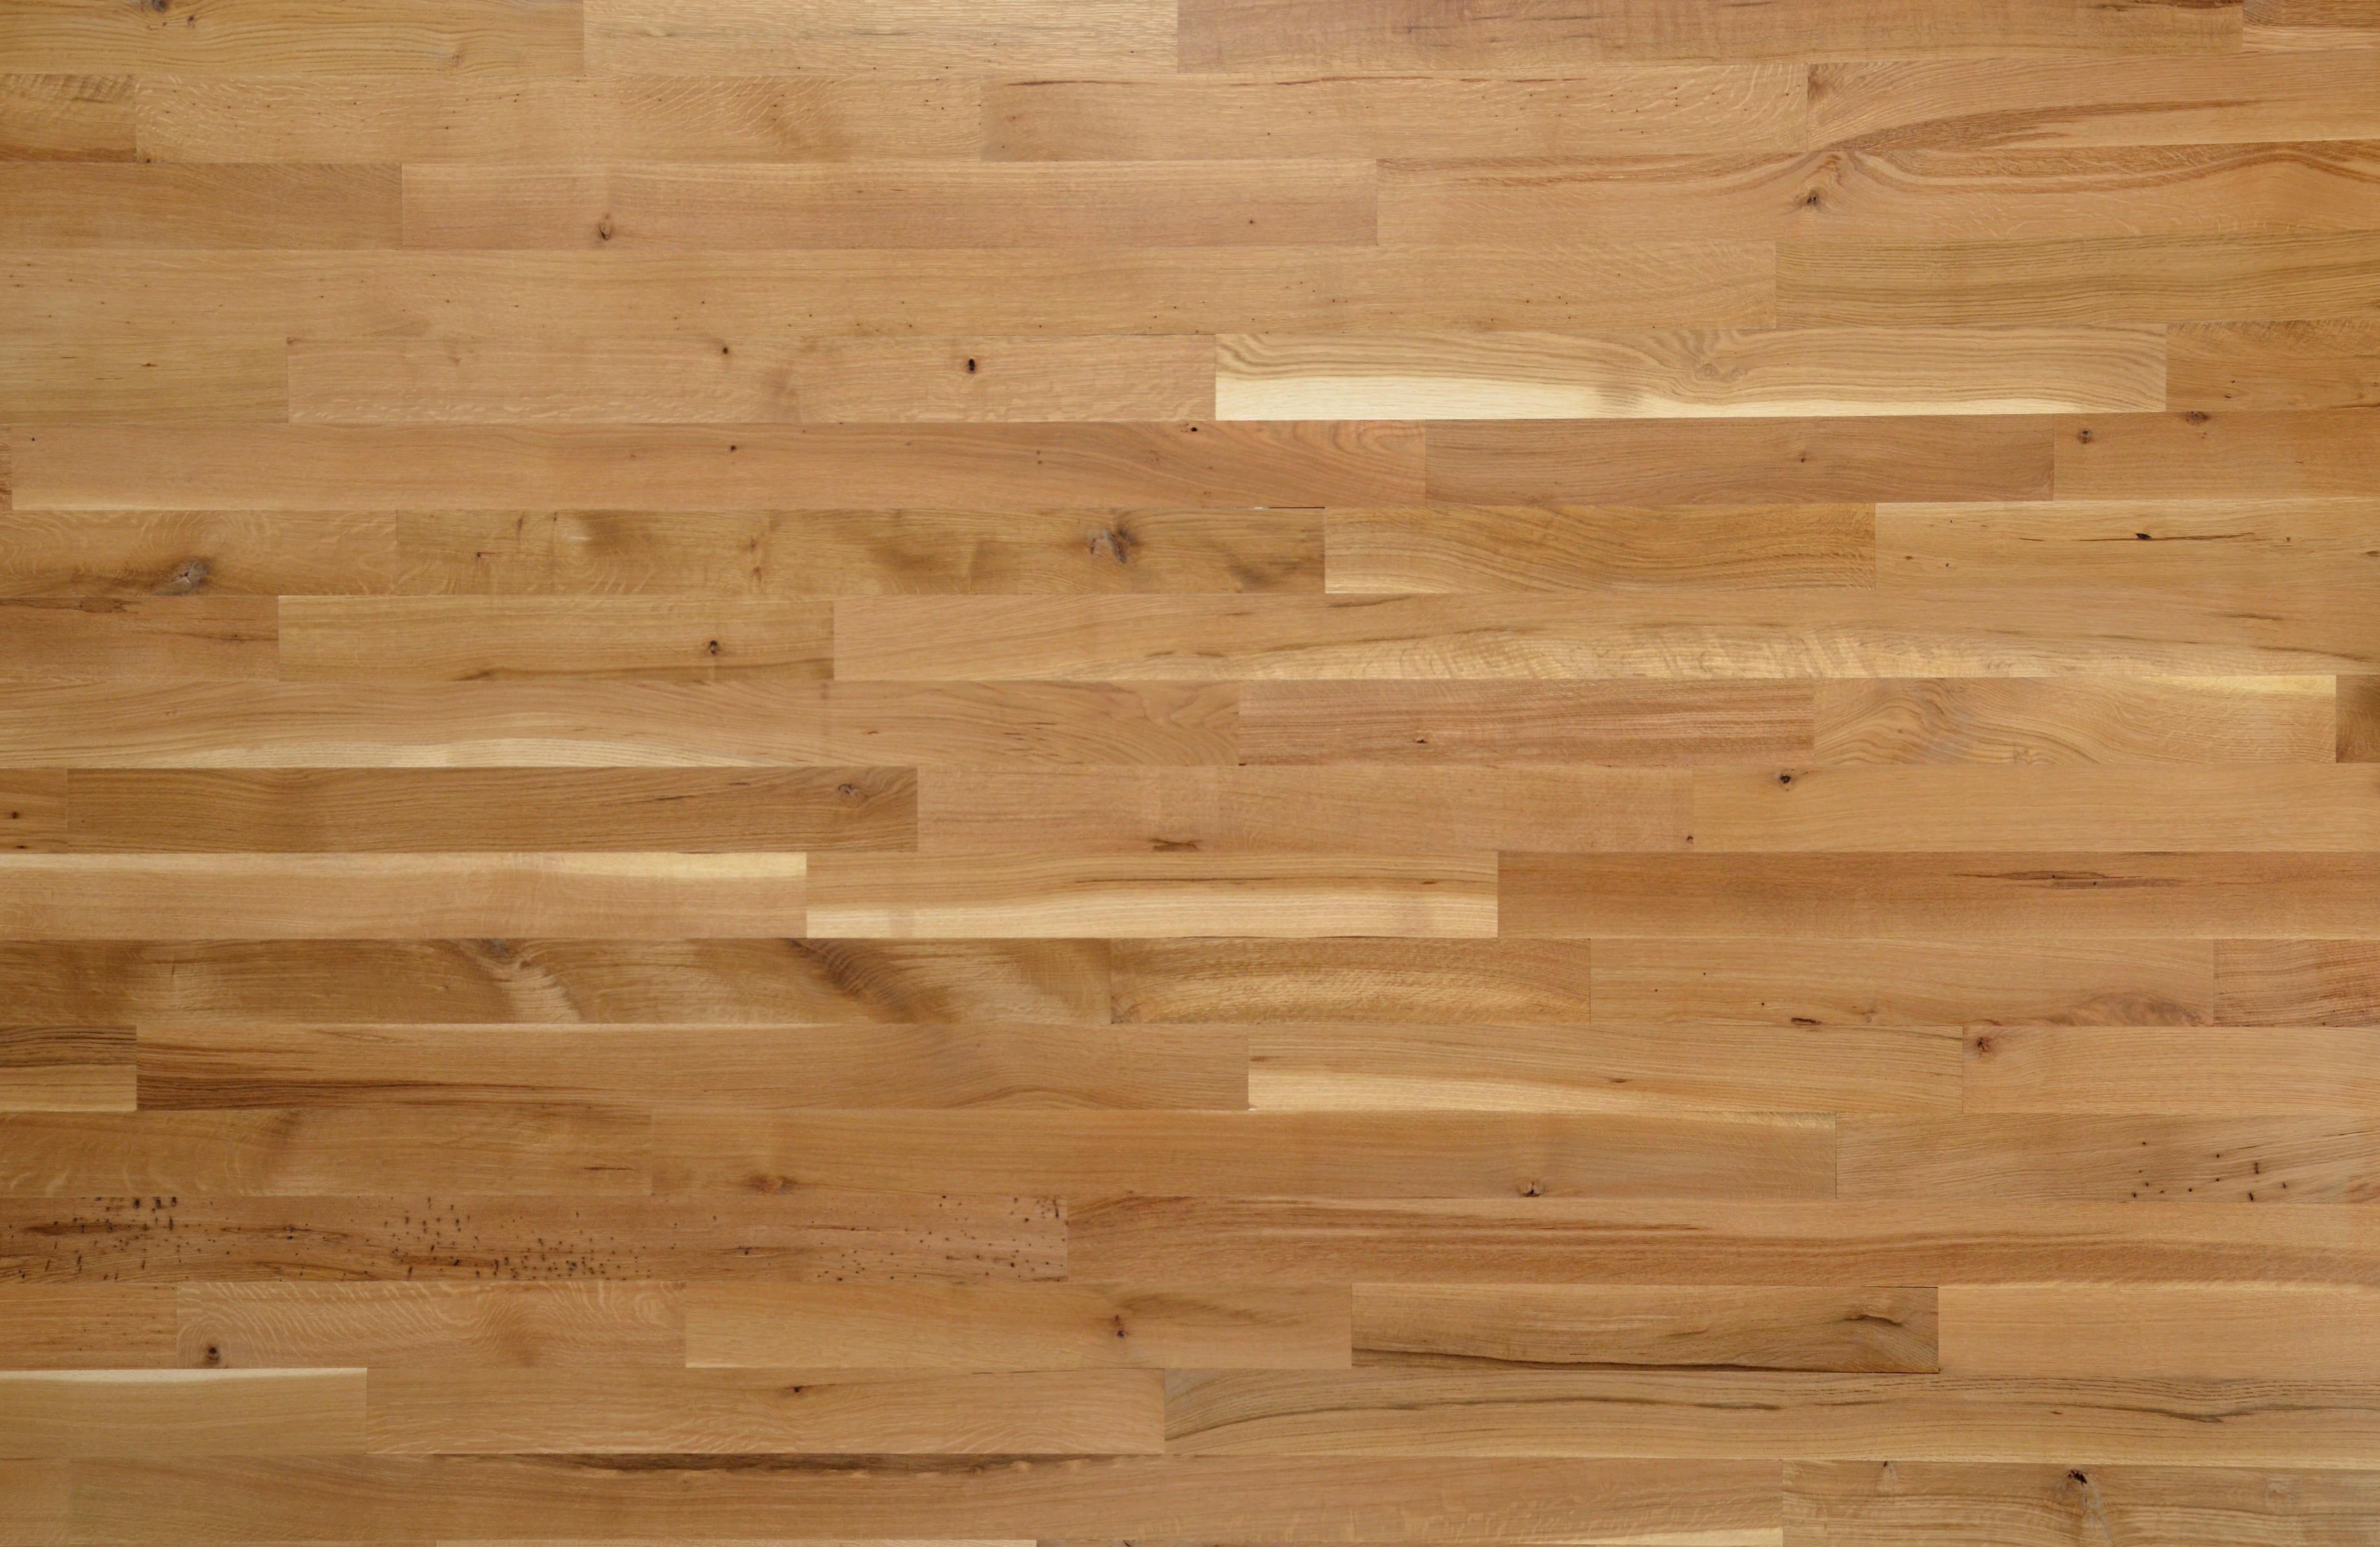 2 1 4 inch engineered hardwood flooring of lacrosse hardwood flooring walnut white oak red oak hickory in rift quartered natural white oak